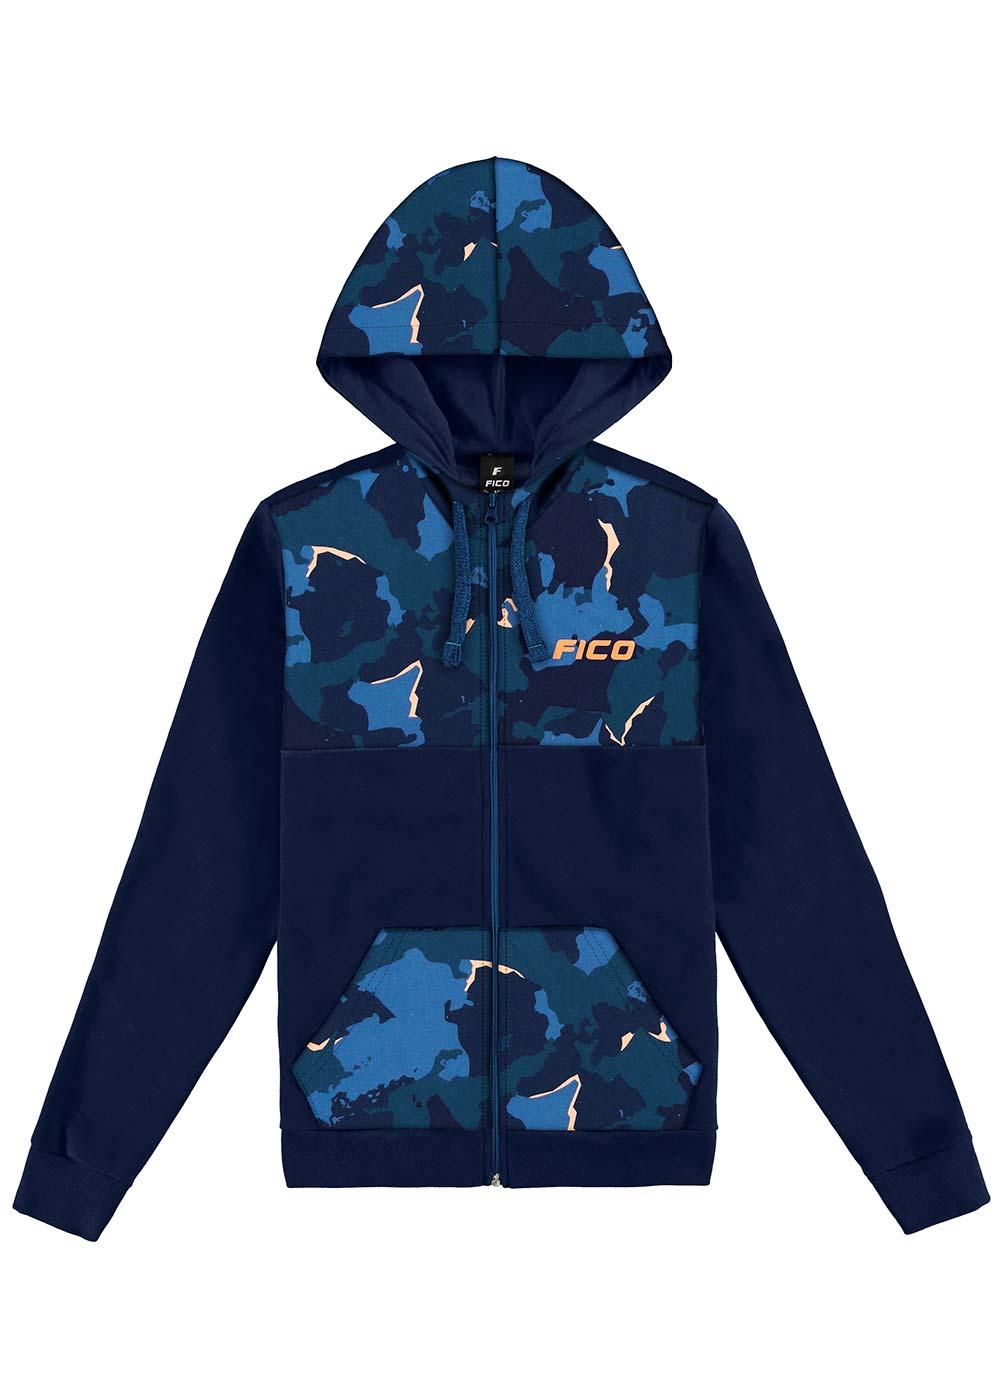 Jaqueta Infantil Masculina Inverno Azul Camuflada Fico